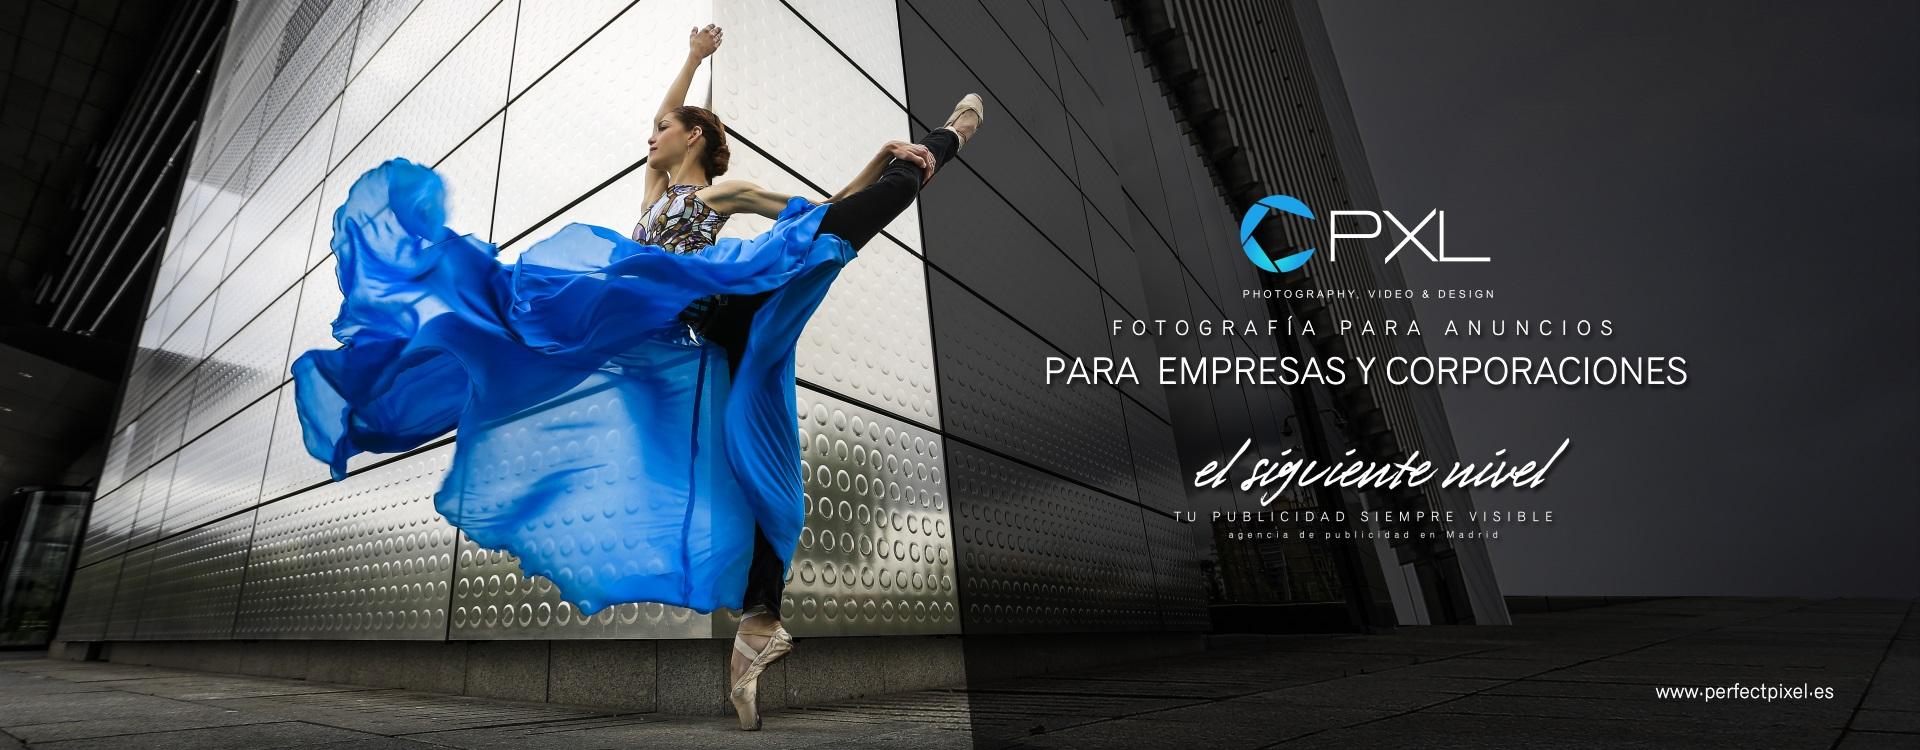 Fotografia-anuncios-Perfect-Pixel-Agencia-de-Publicidad-en-Madrid